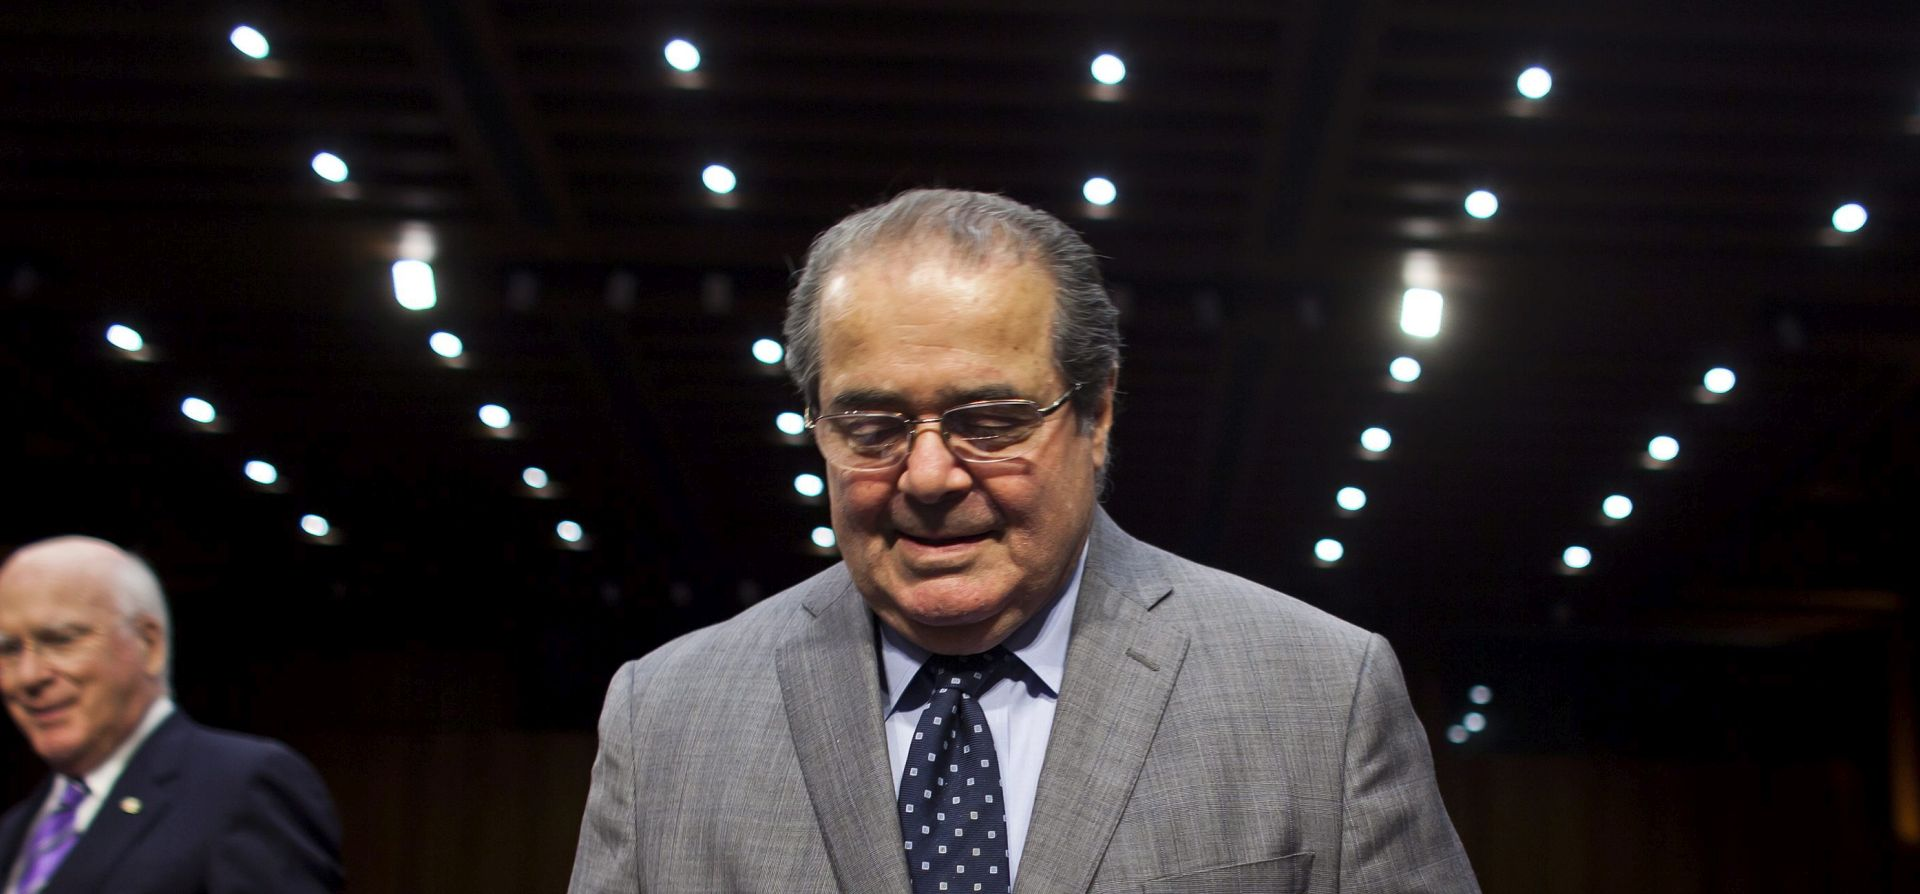 Preminuo konzervativni sudac Vrhovnog suda SAD-a Antonin Scalia